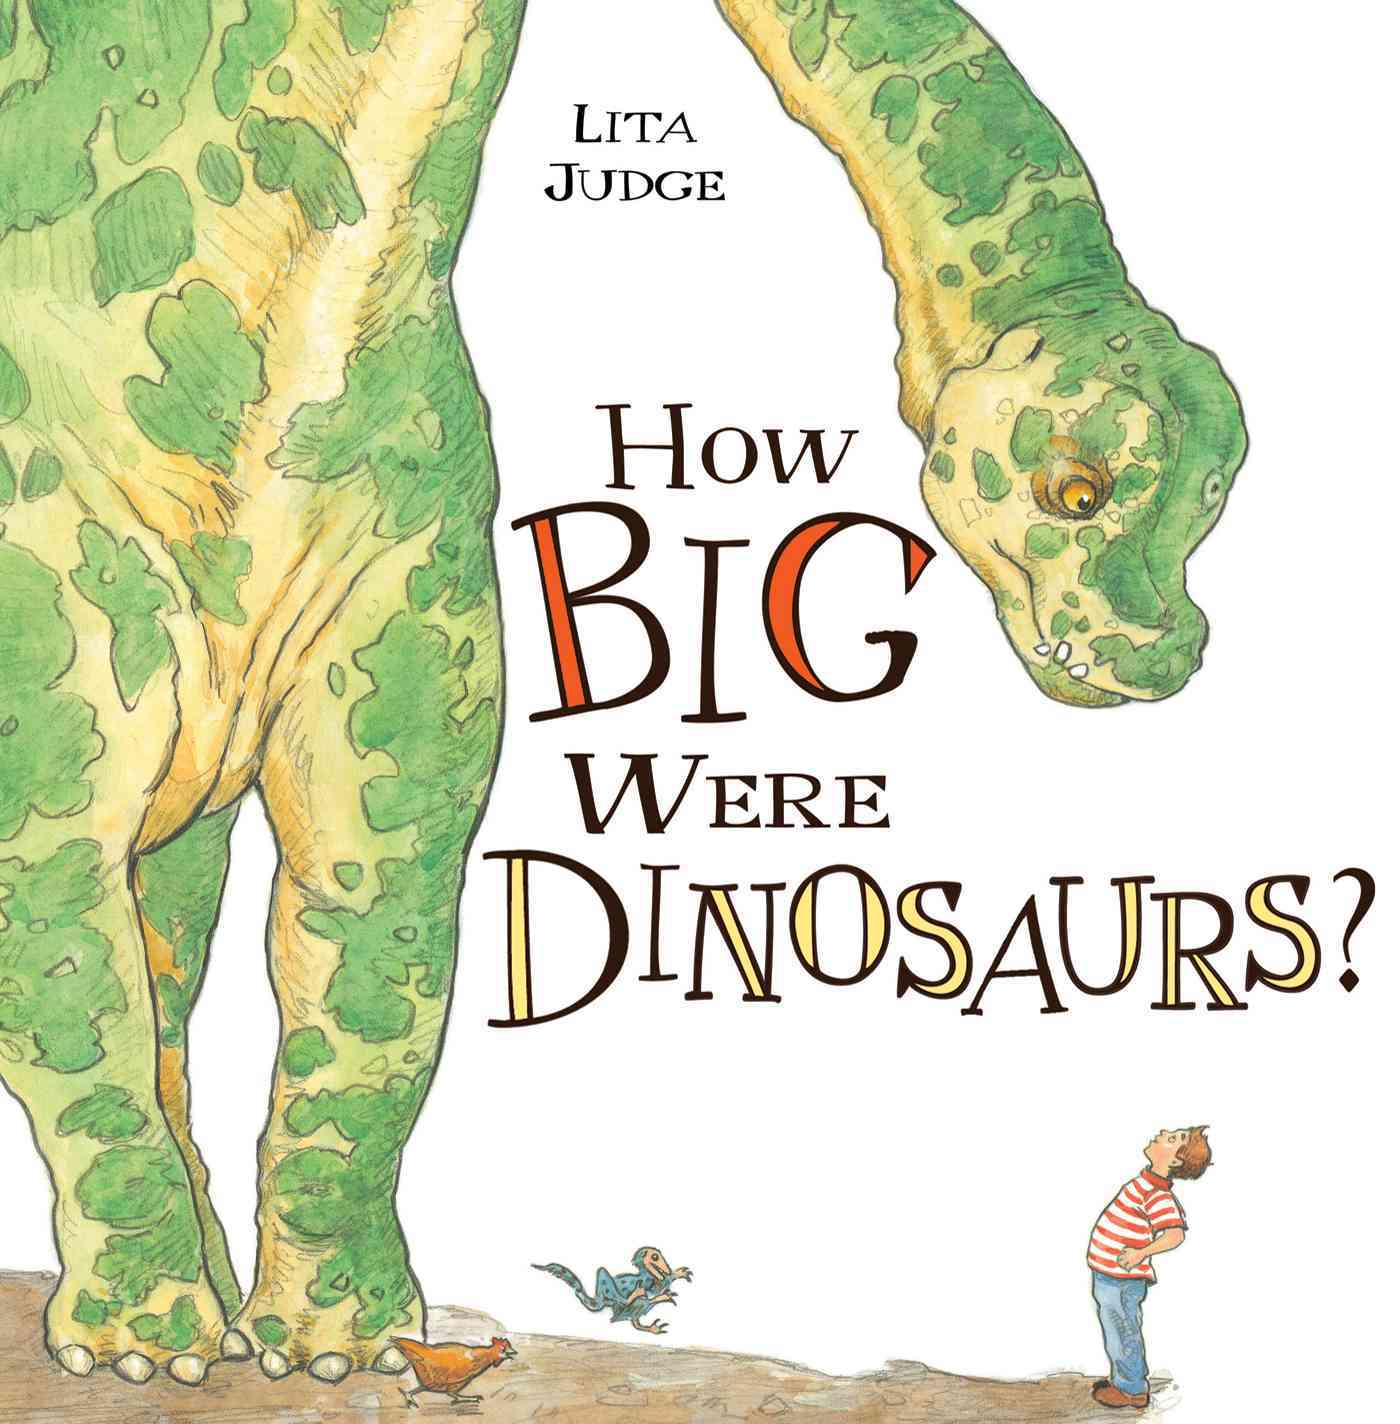 How Big Were Dinosaurs? By Judge, Lita